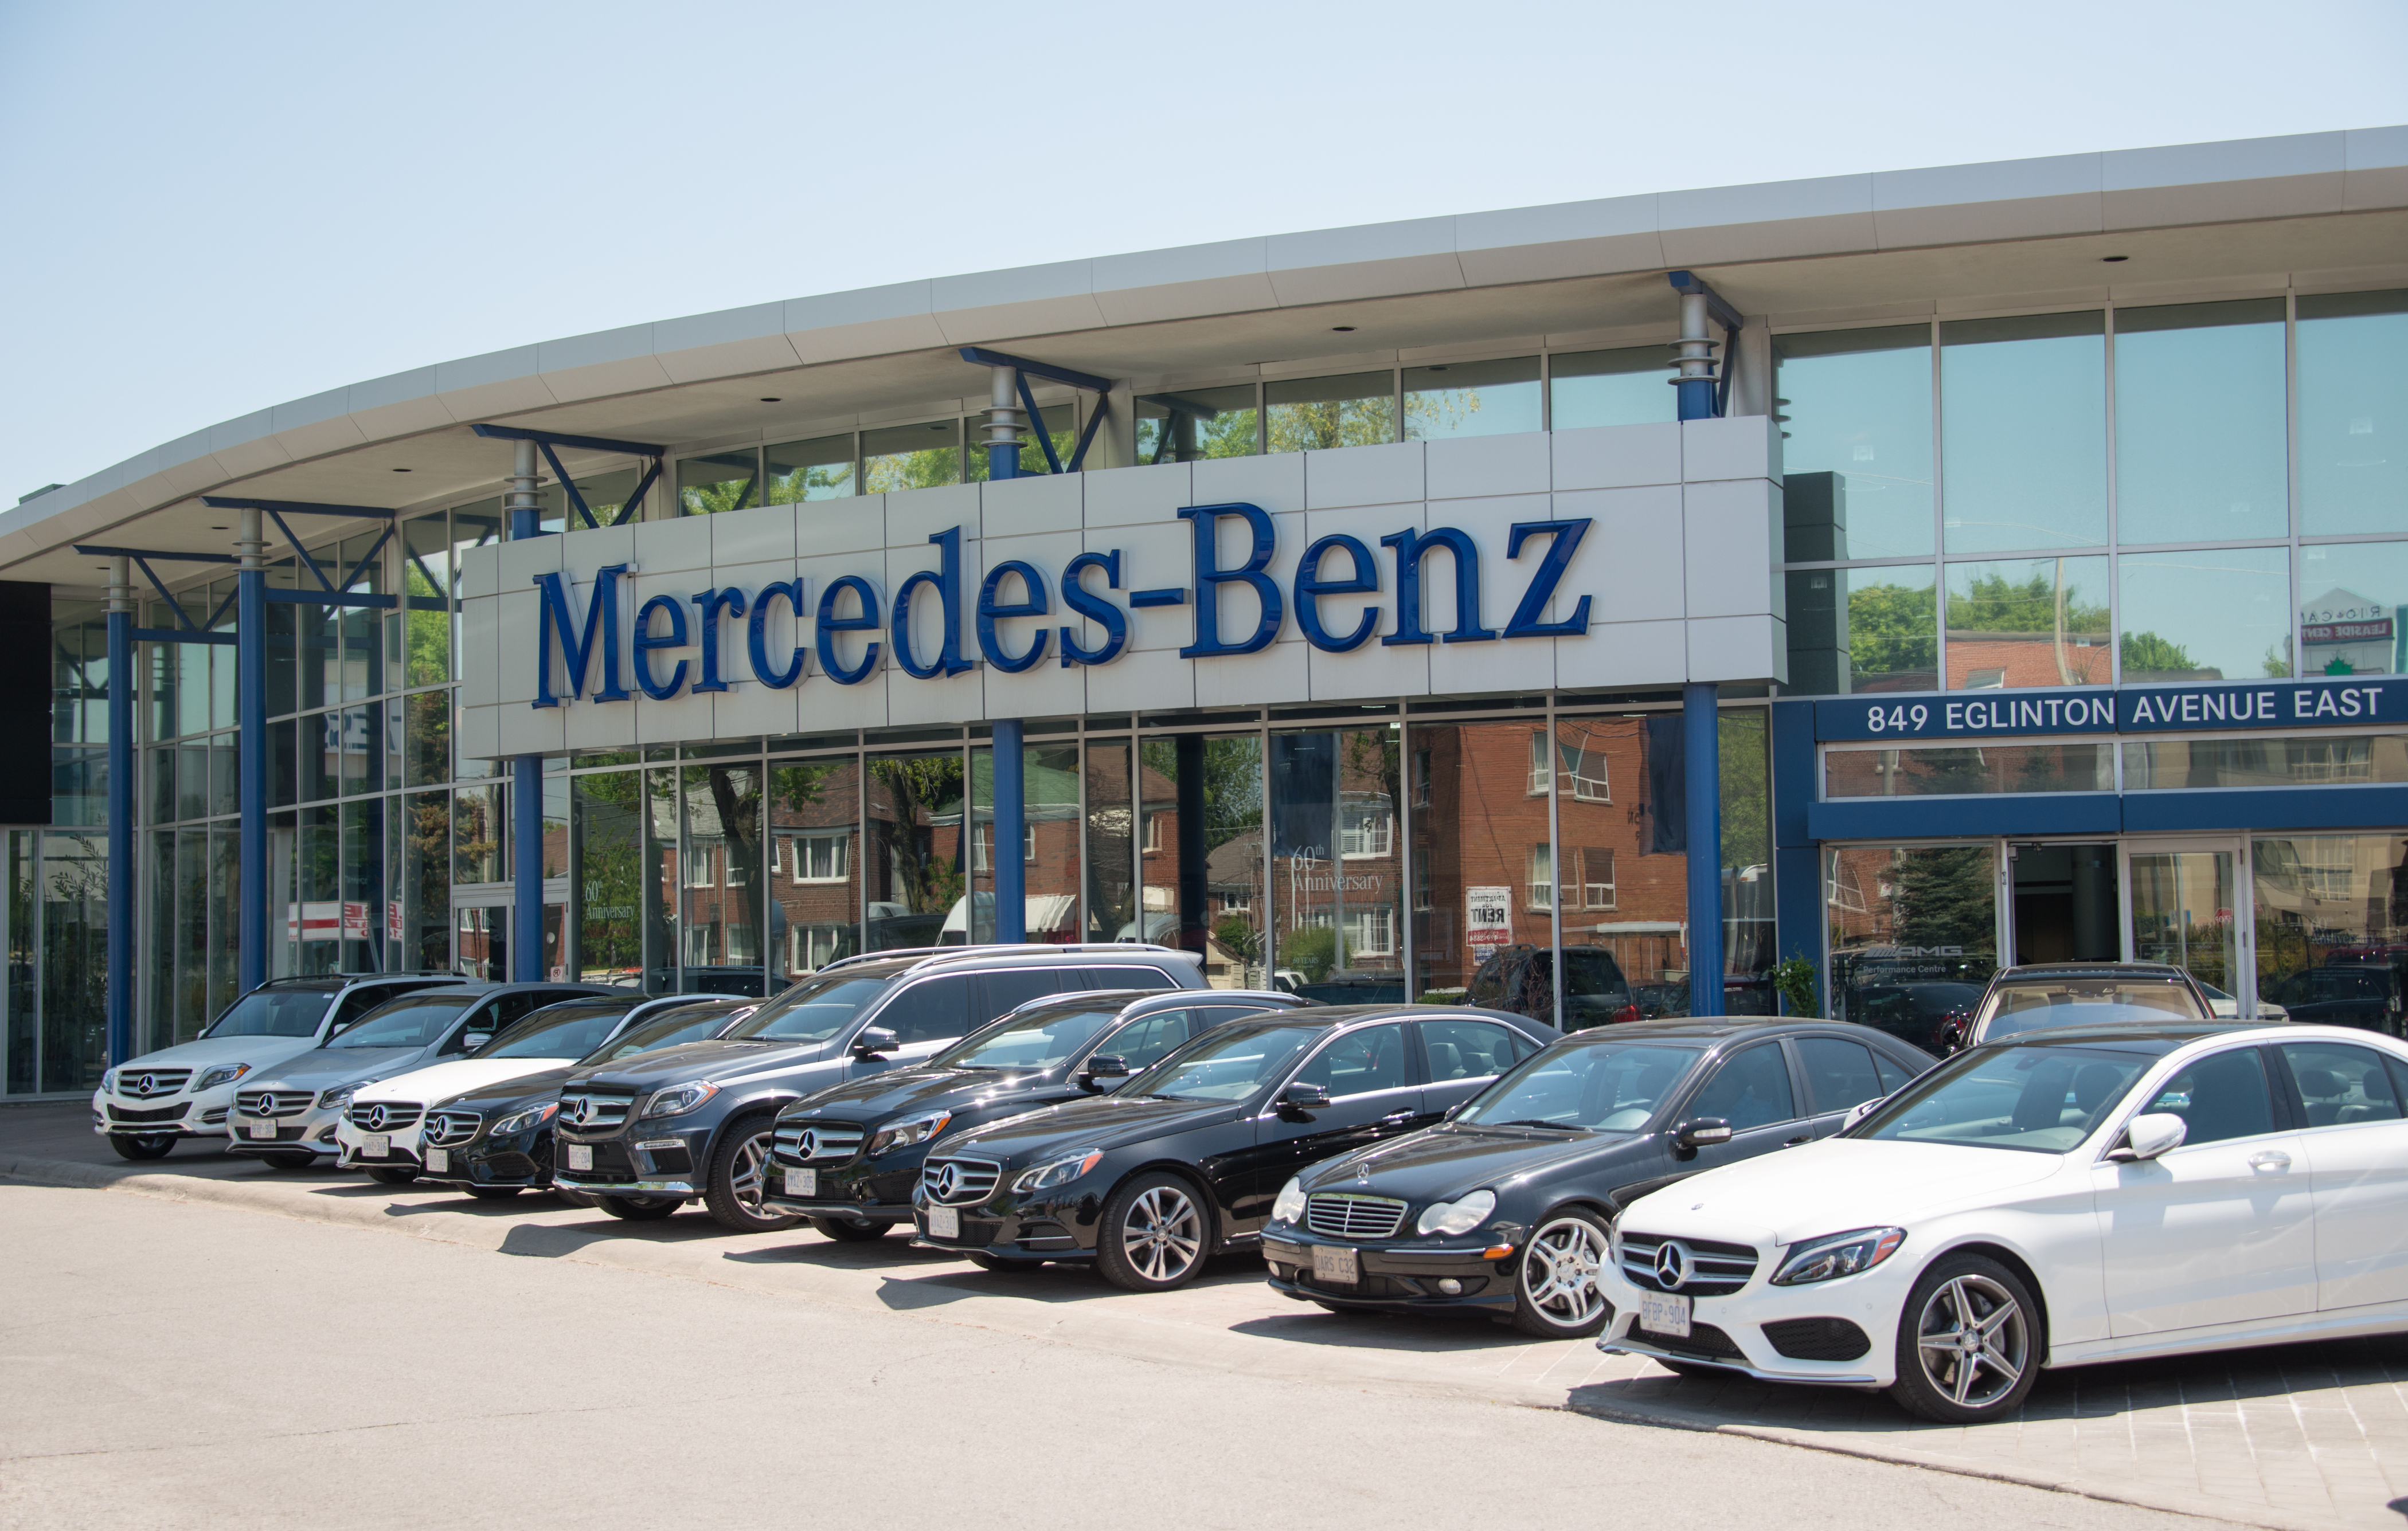 Mercedes Benz dealer in a city, outdoor display of the German luxury car.